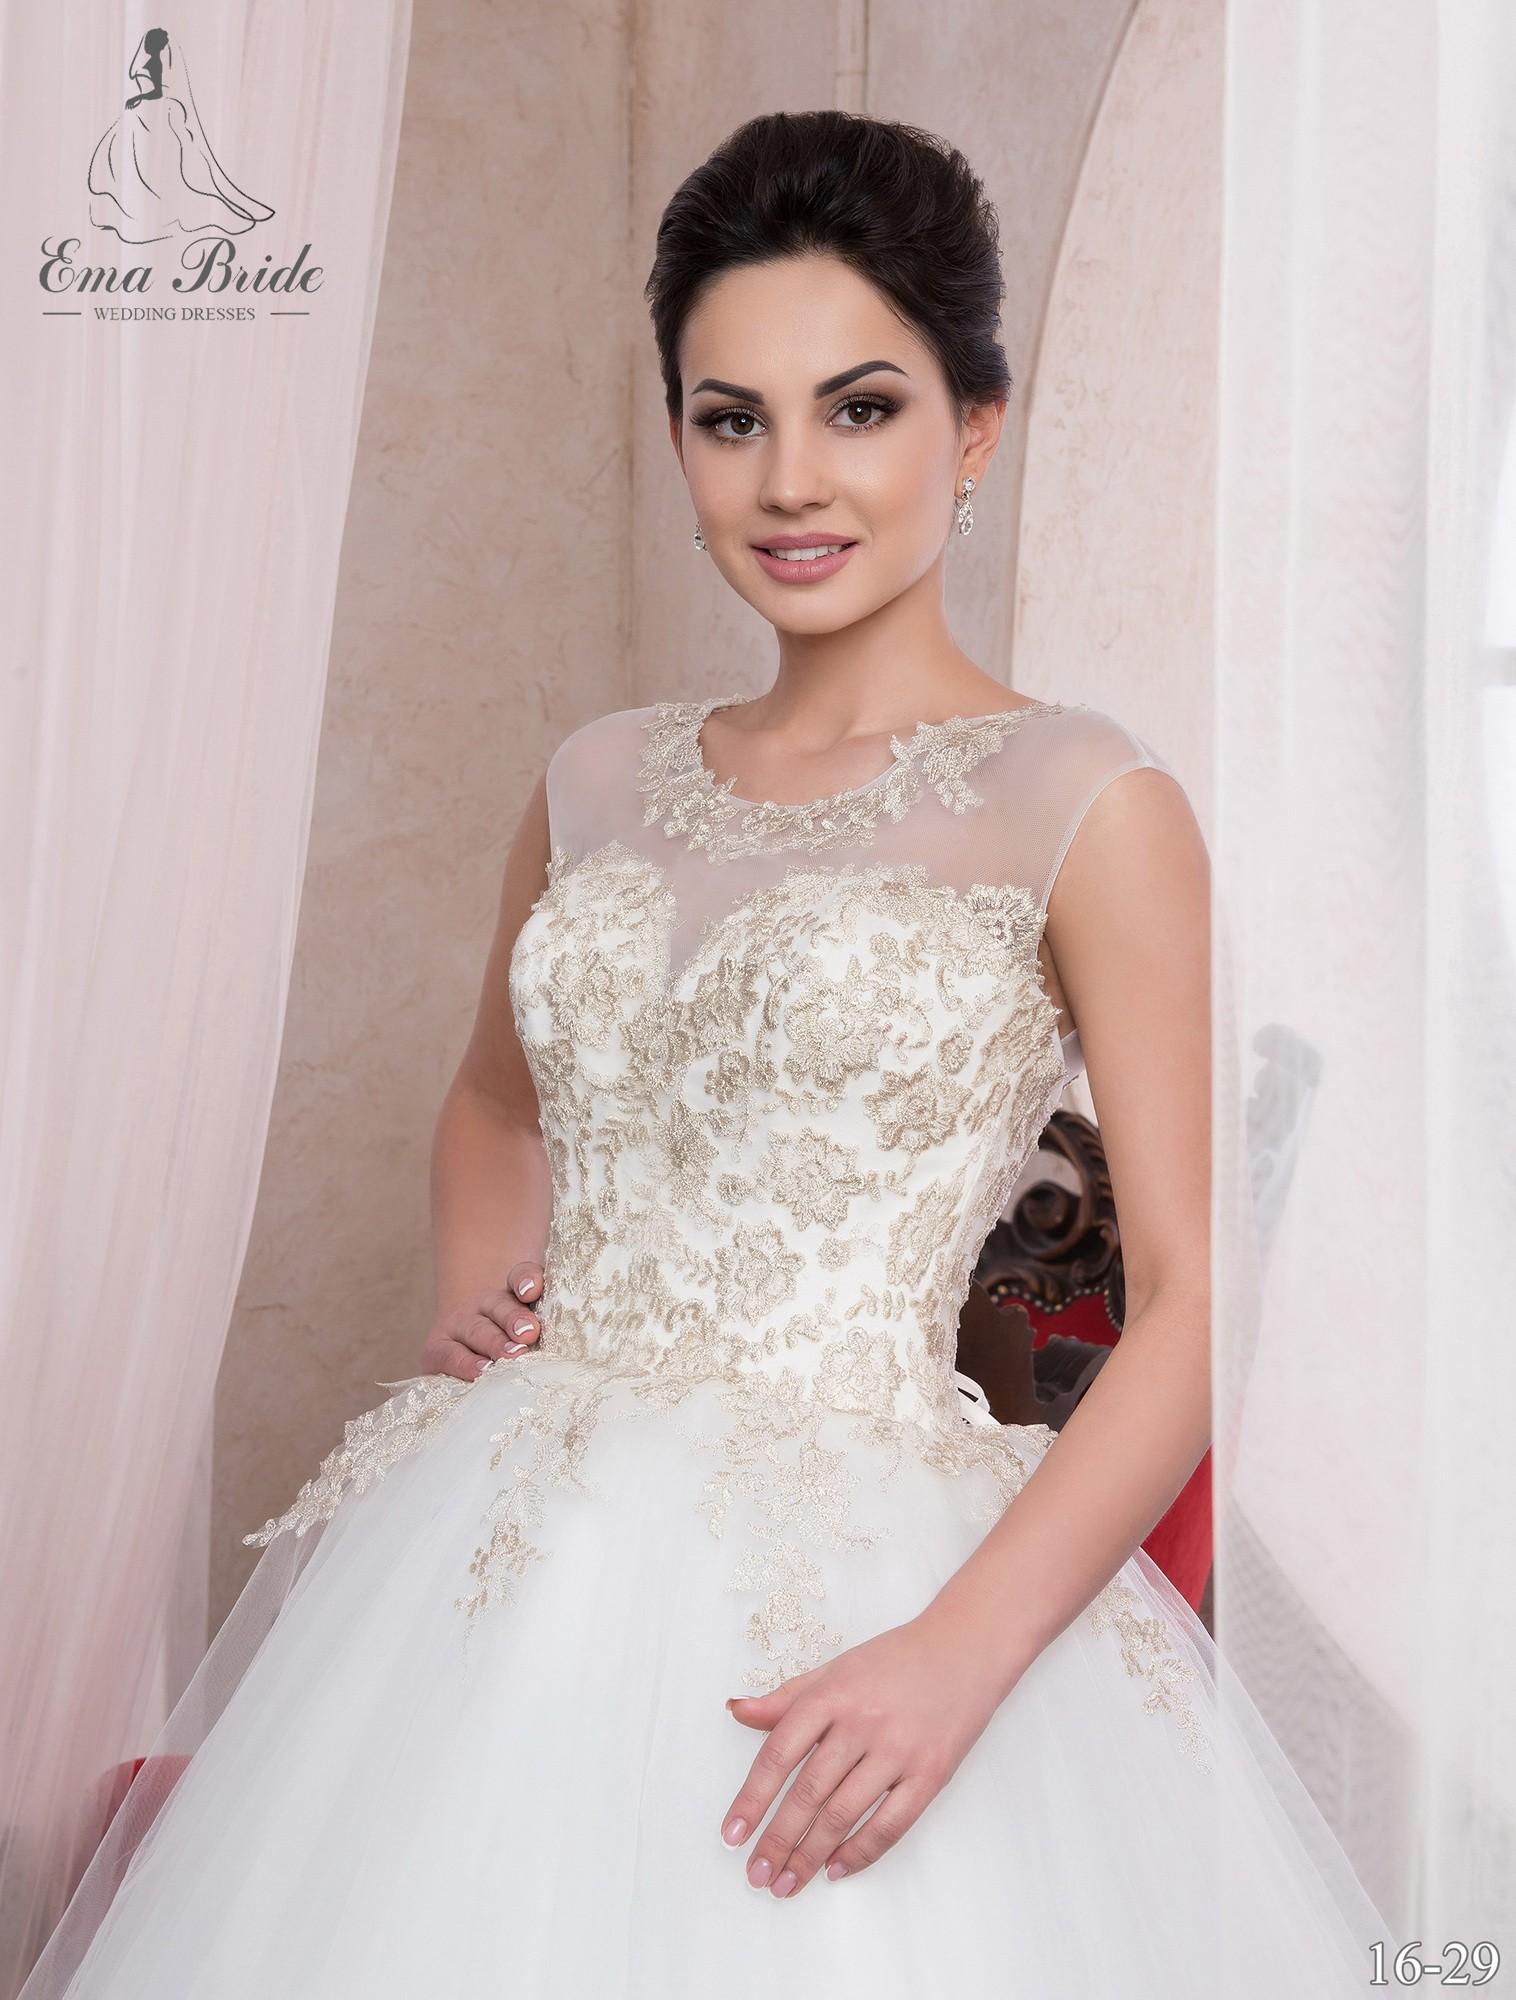 Wedding dress 16-29 wholesale